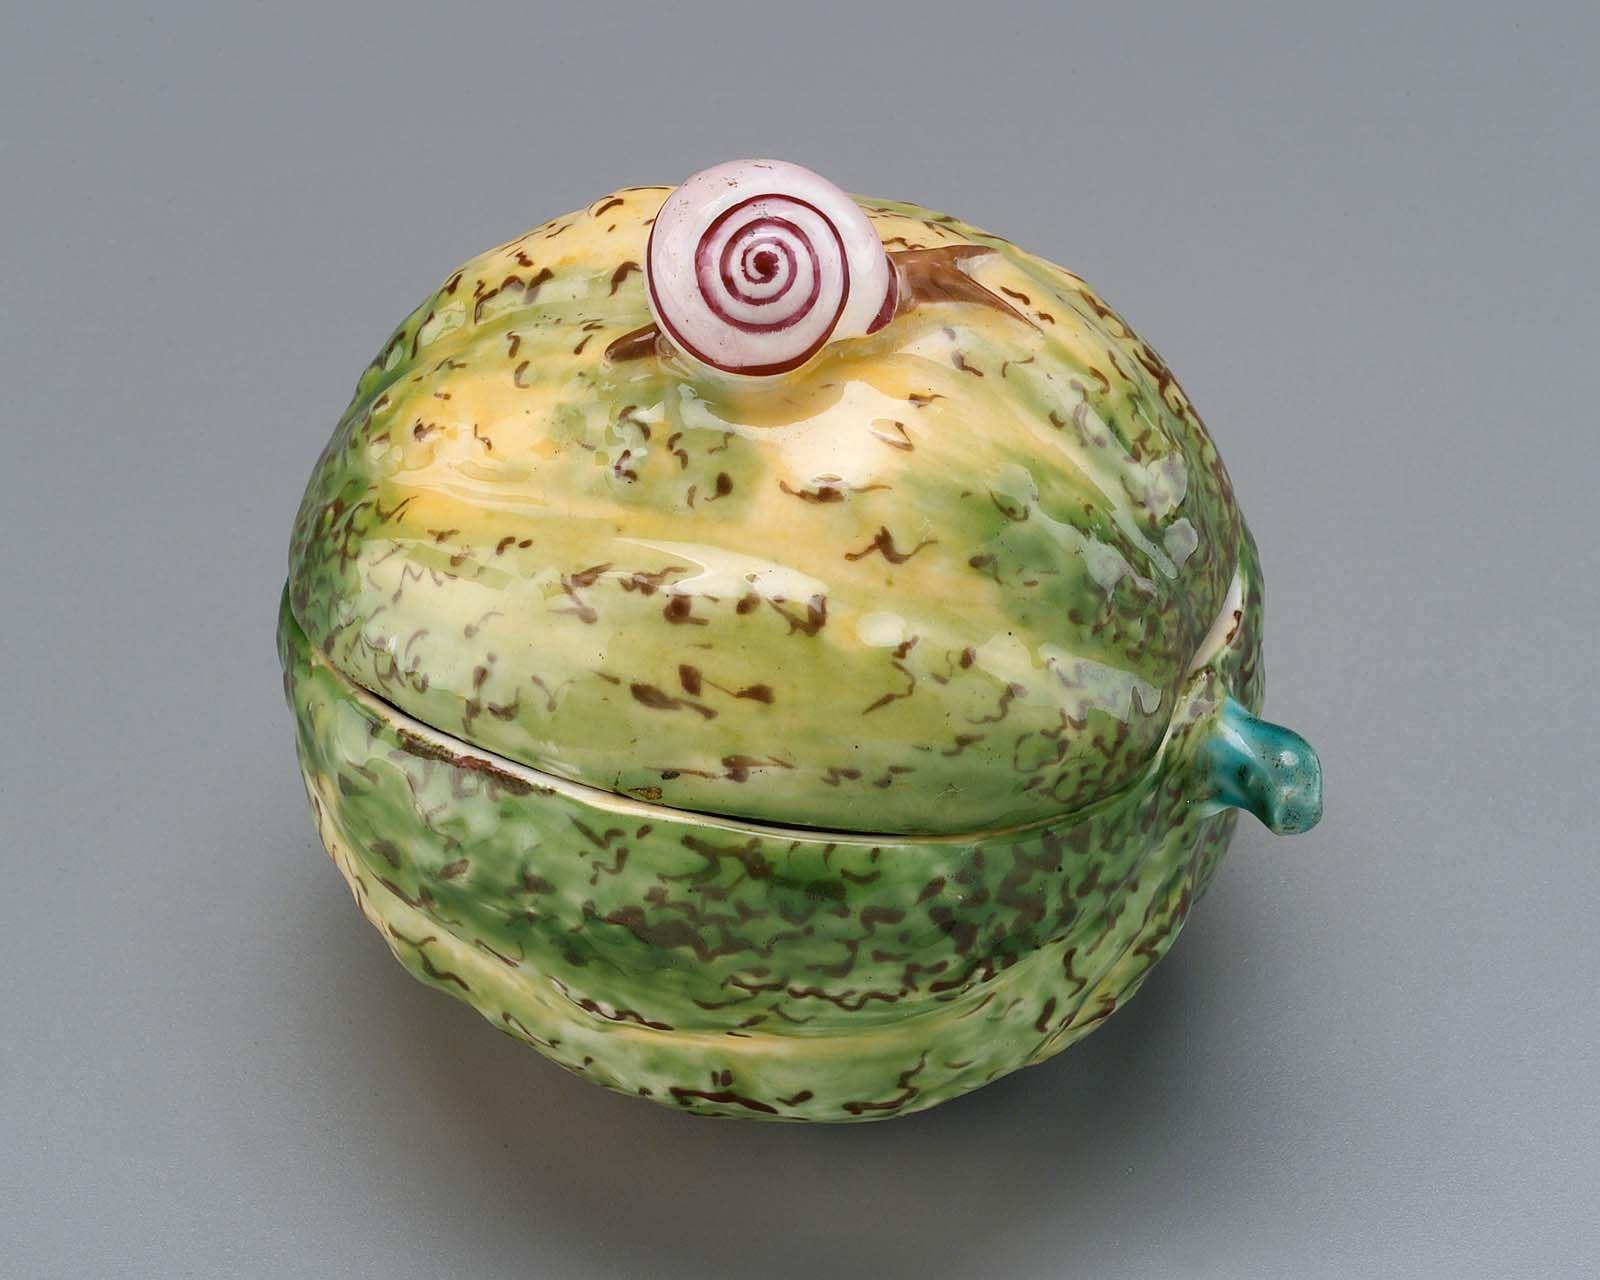 Natural colors snail finial. Natural ColorsSnailsDishesDinnerwareUtensils PlatesDish & a \u003d lid; b \u003d dish). Natural colors snail finial.   Snails ...